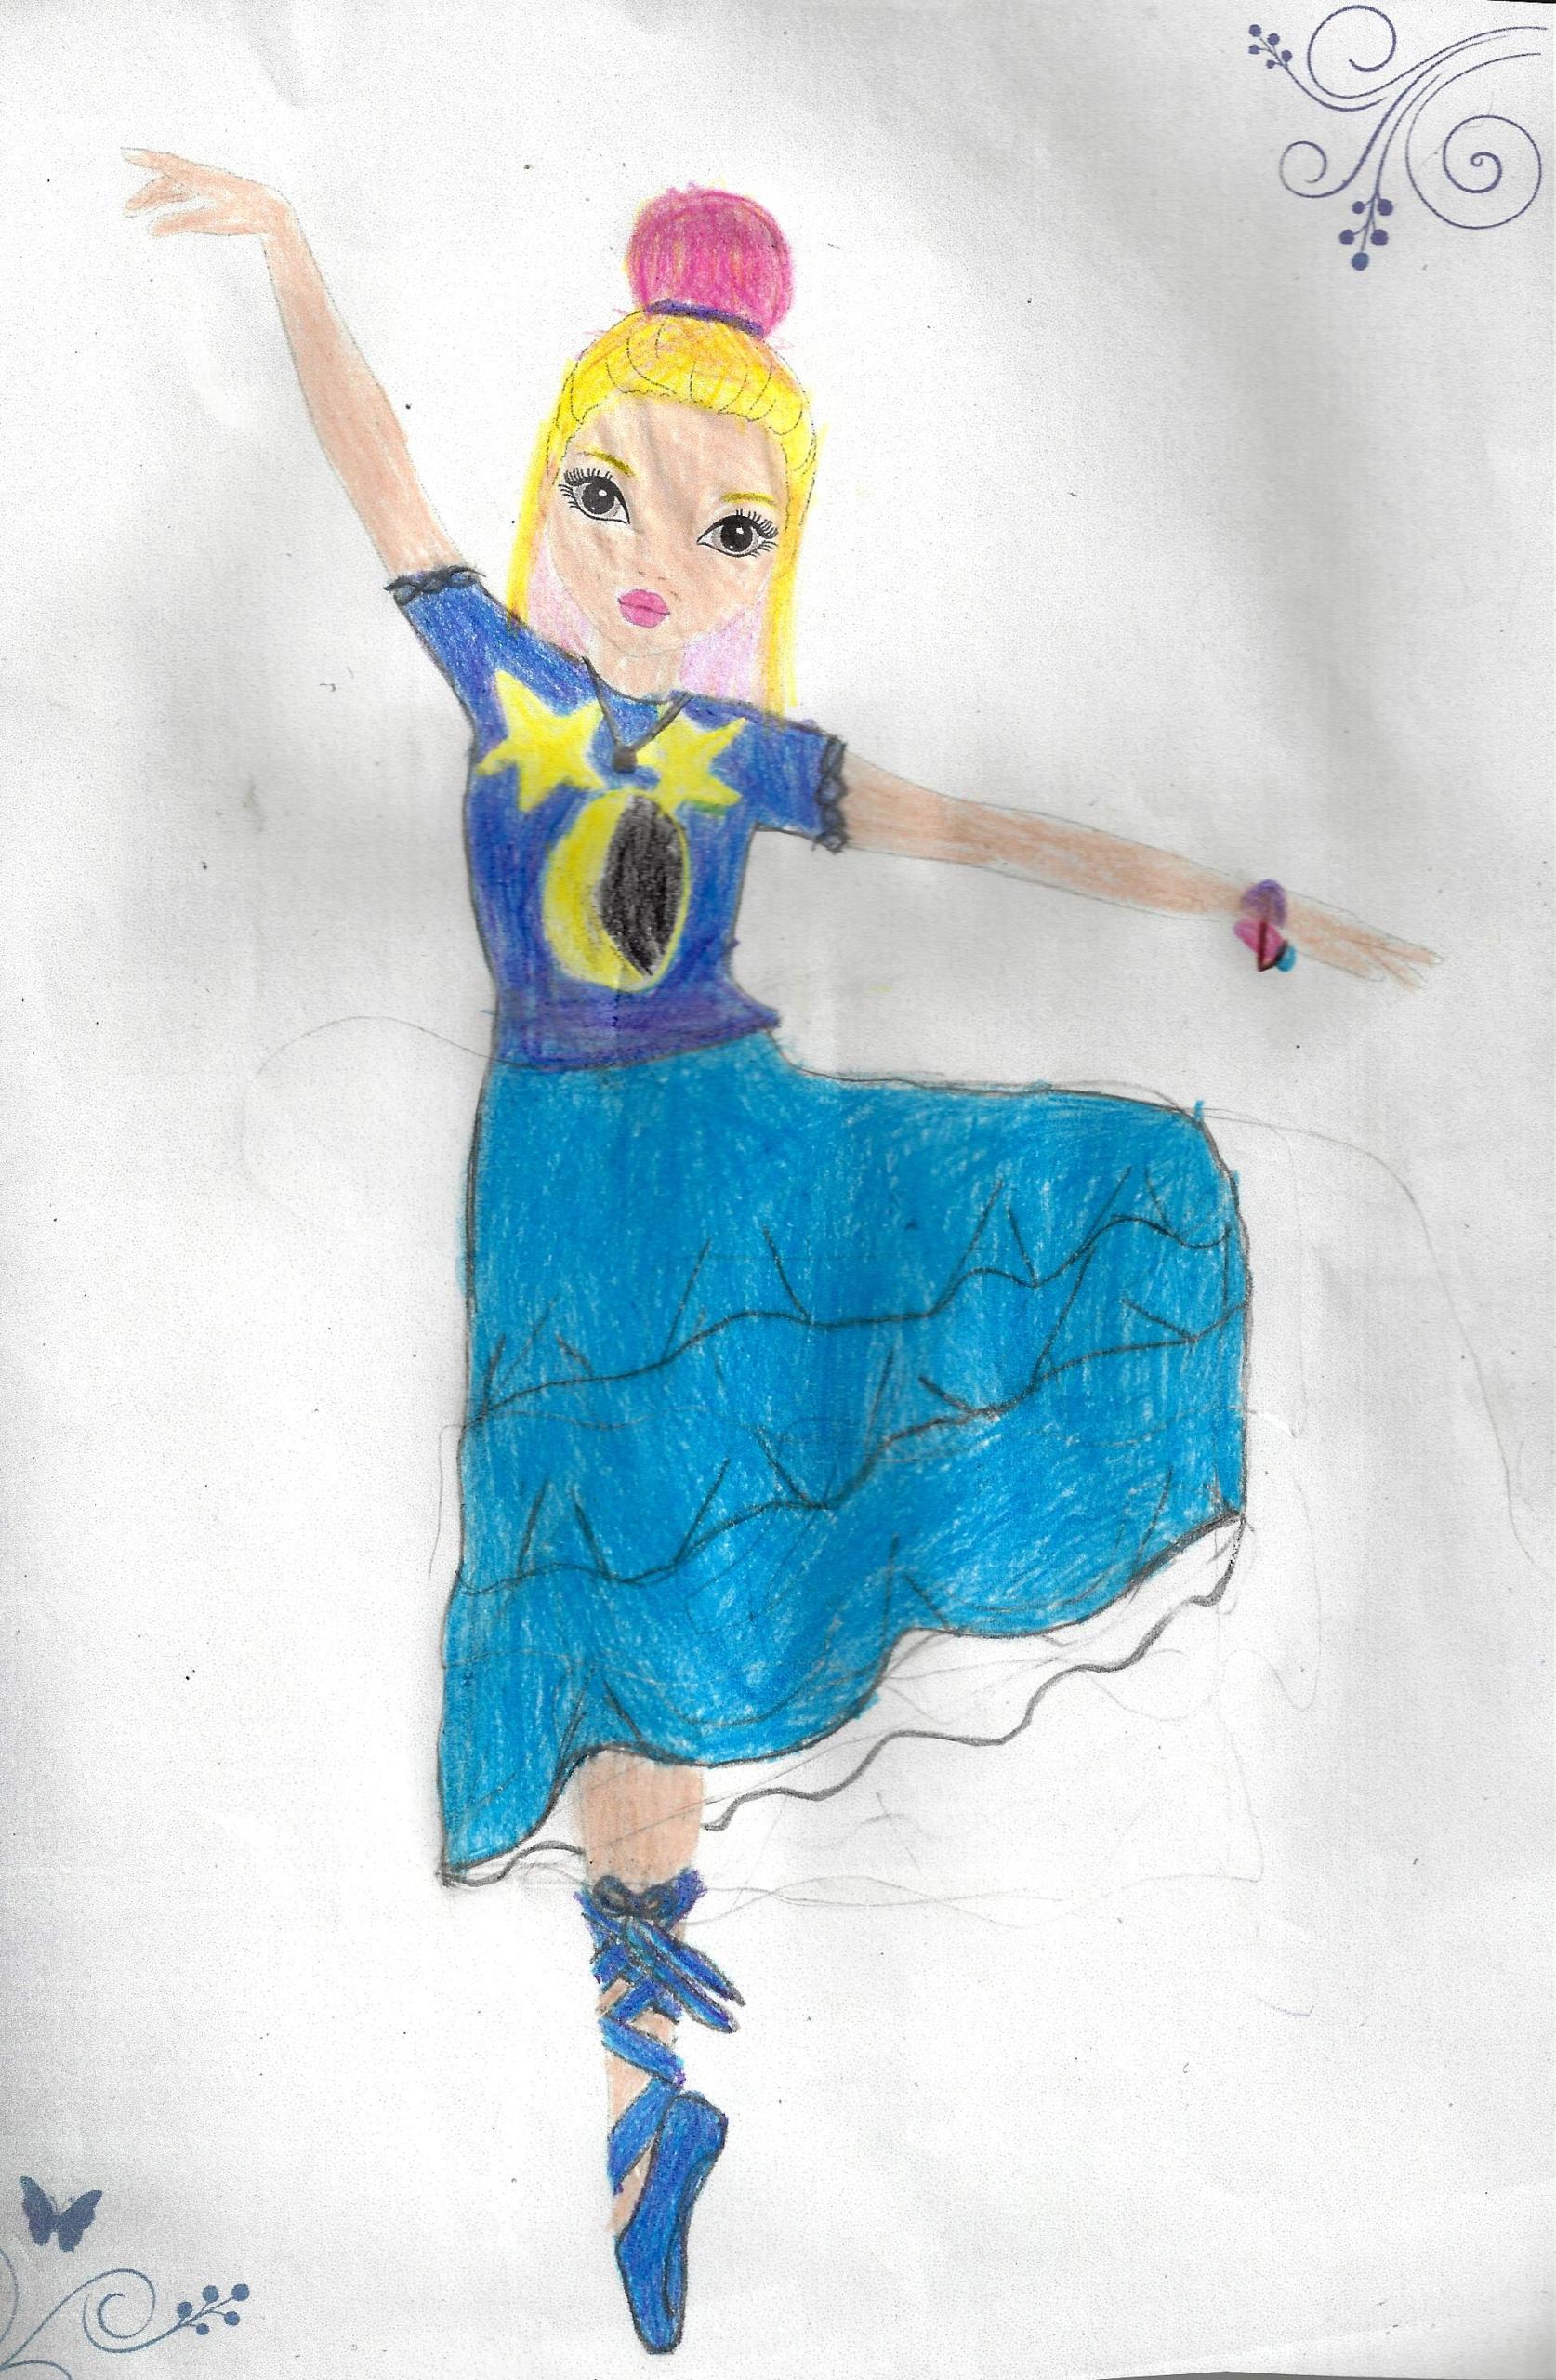 Juliana Z., 6 Jahre, aus Kempten